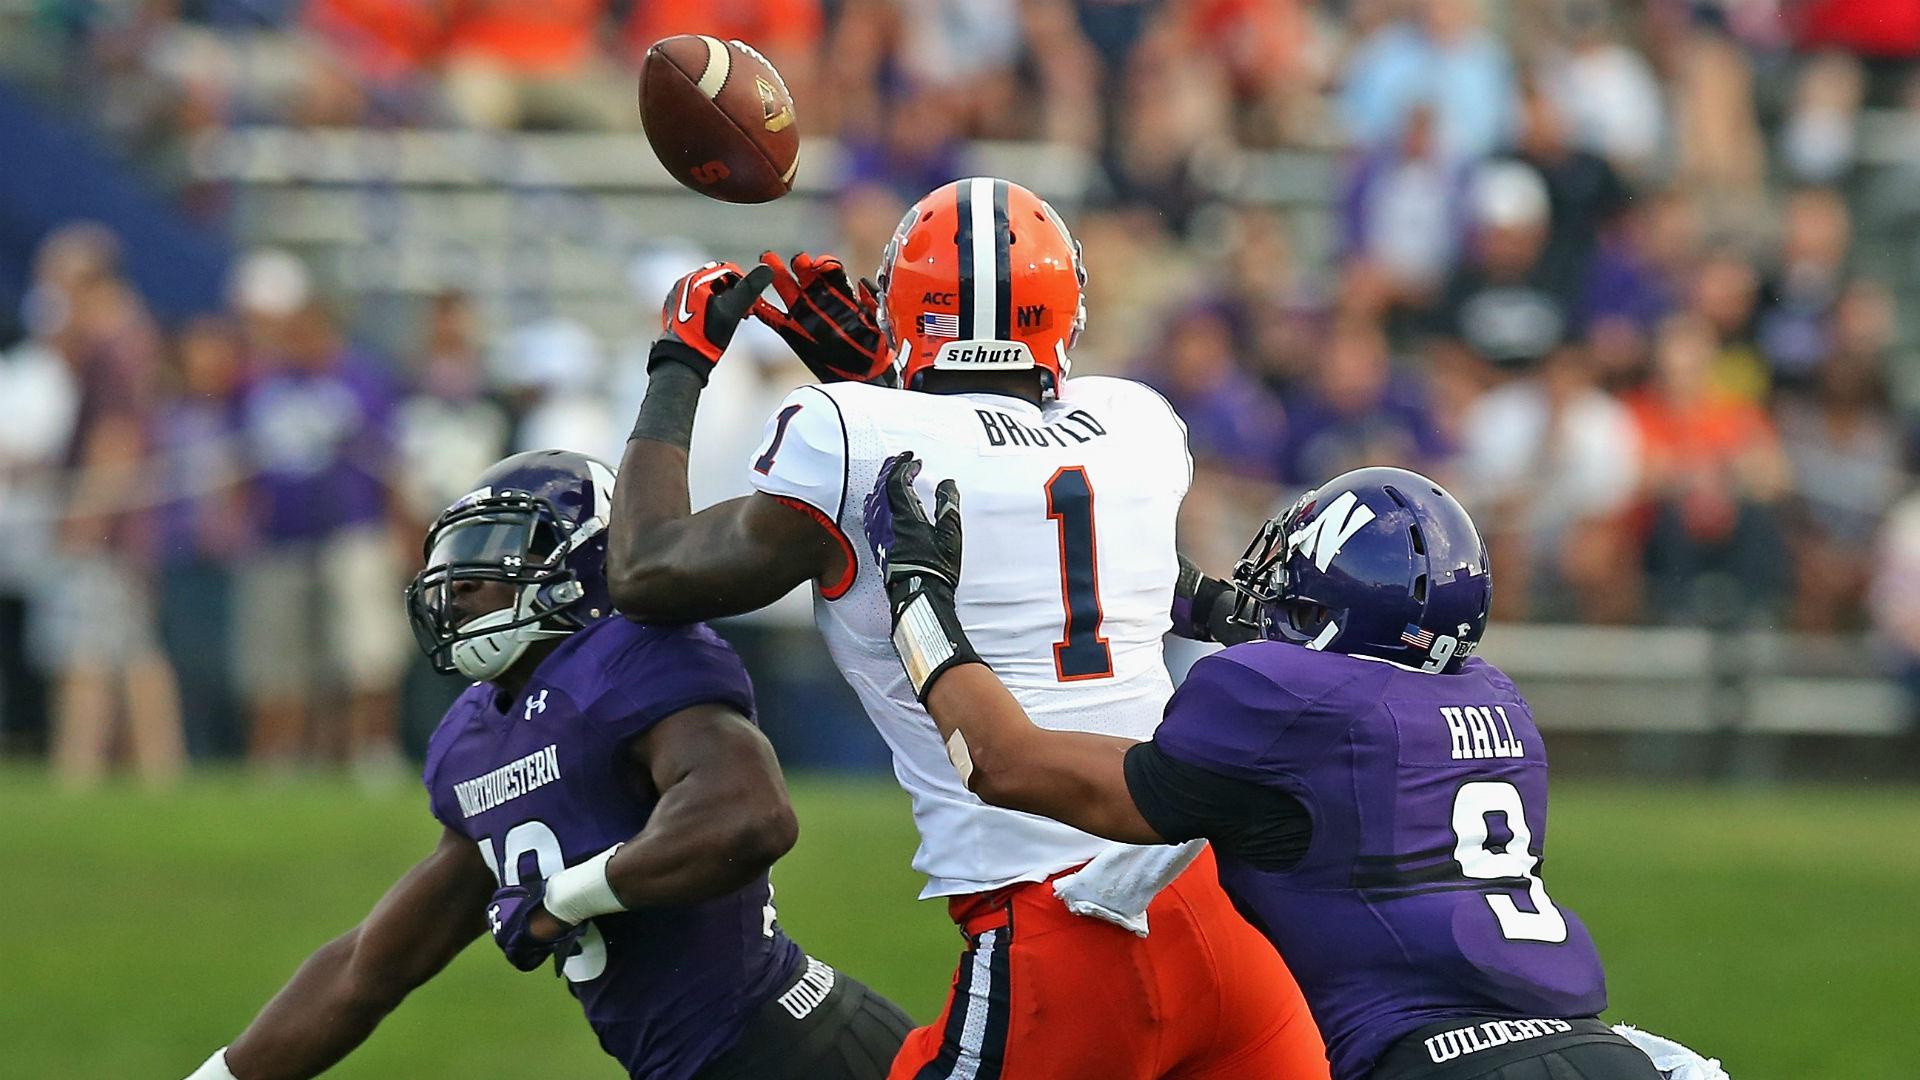 Syracuse parts ways with 2013 leading receiver Ashton Broyld